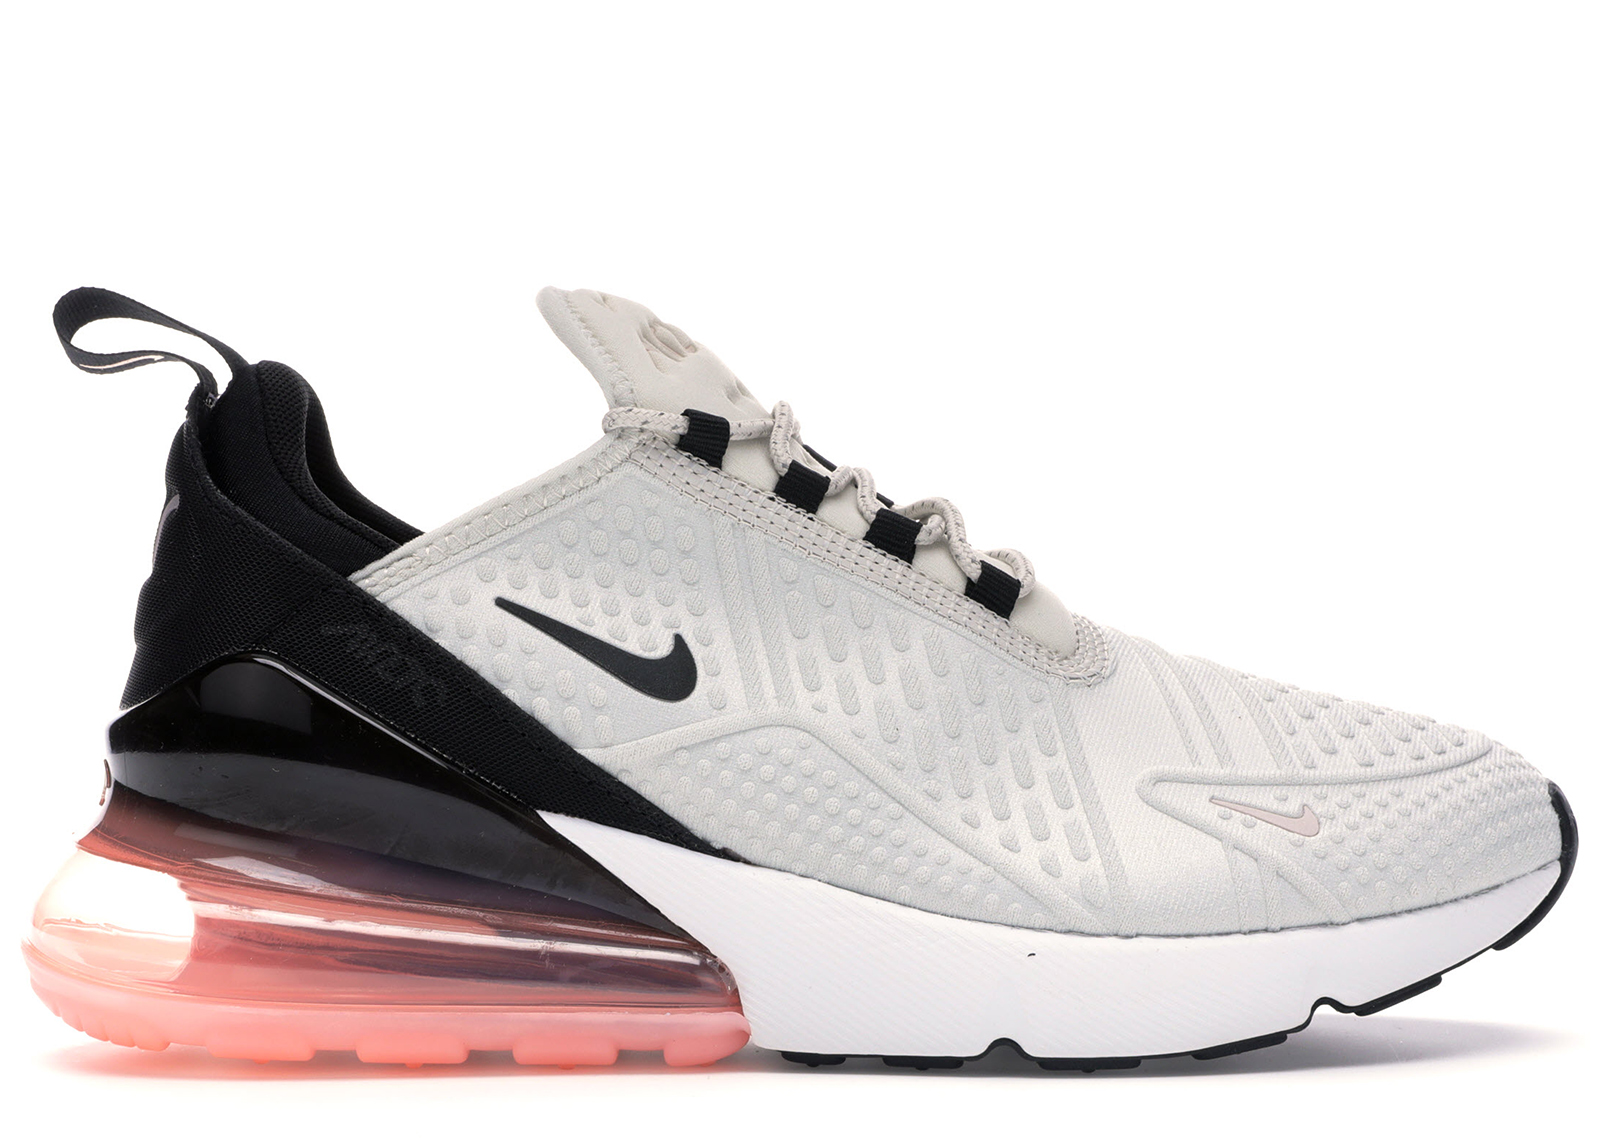 Nike Air Max 270 SE Light Bone Storm Pink (W)